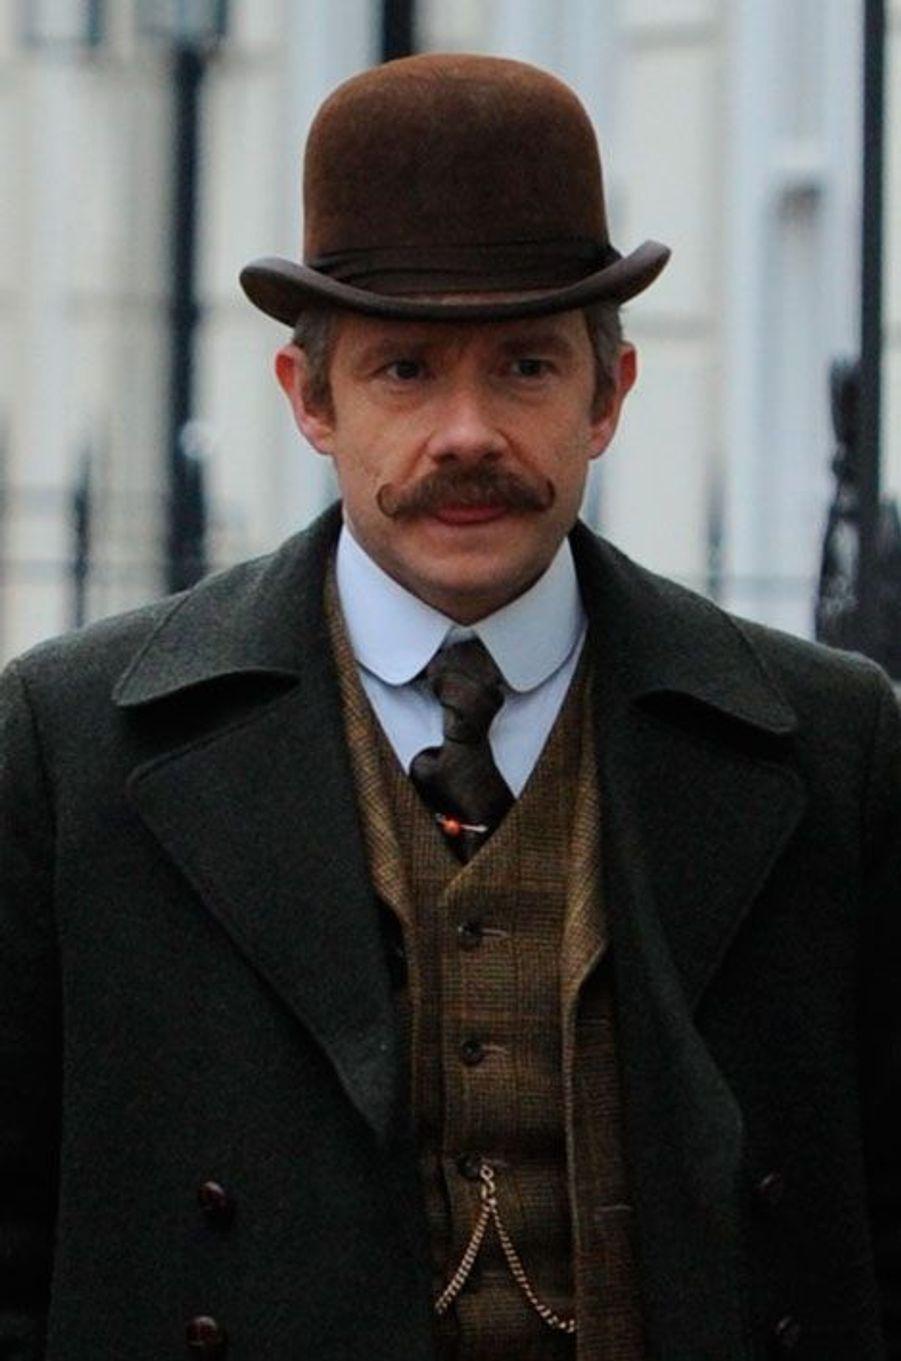 Sherlock Holmes remonte le temps